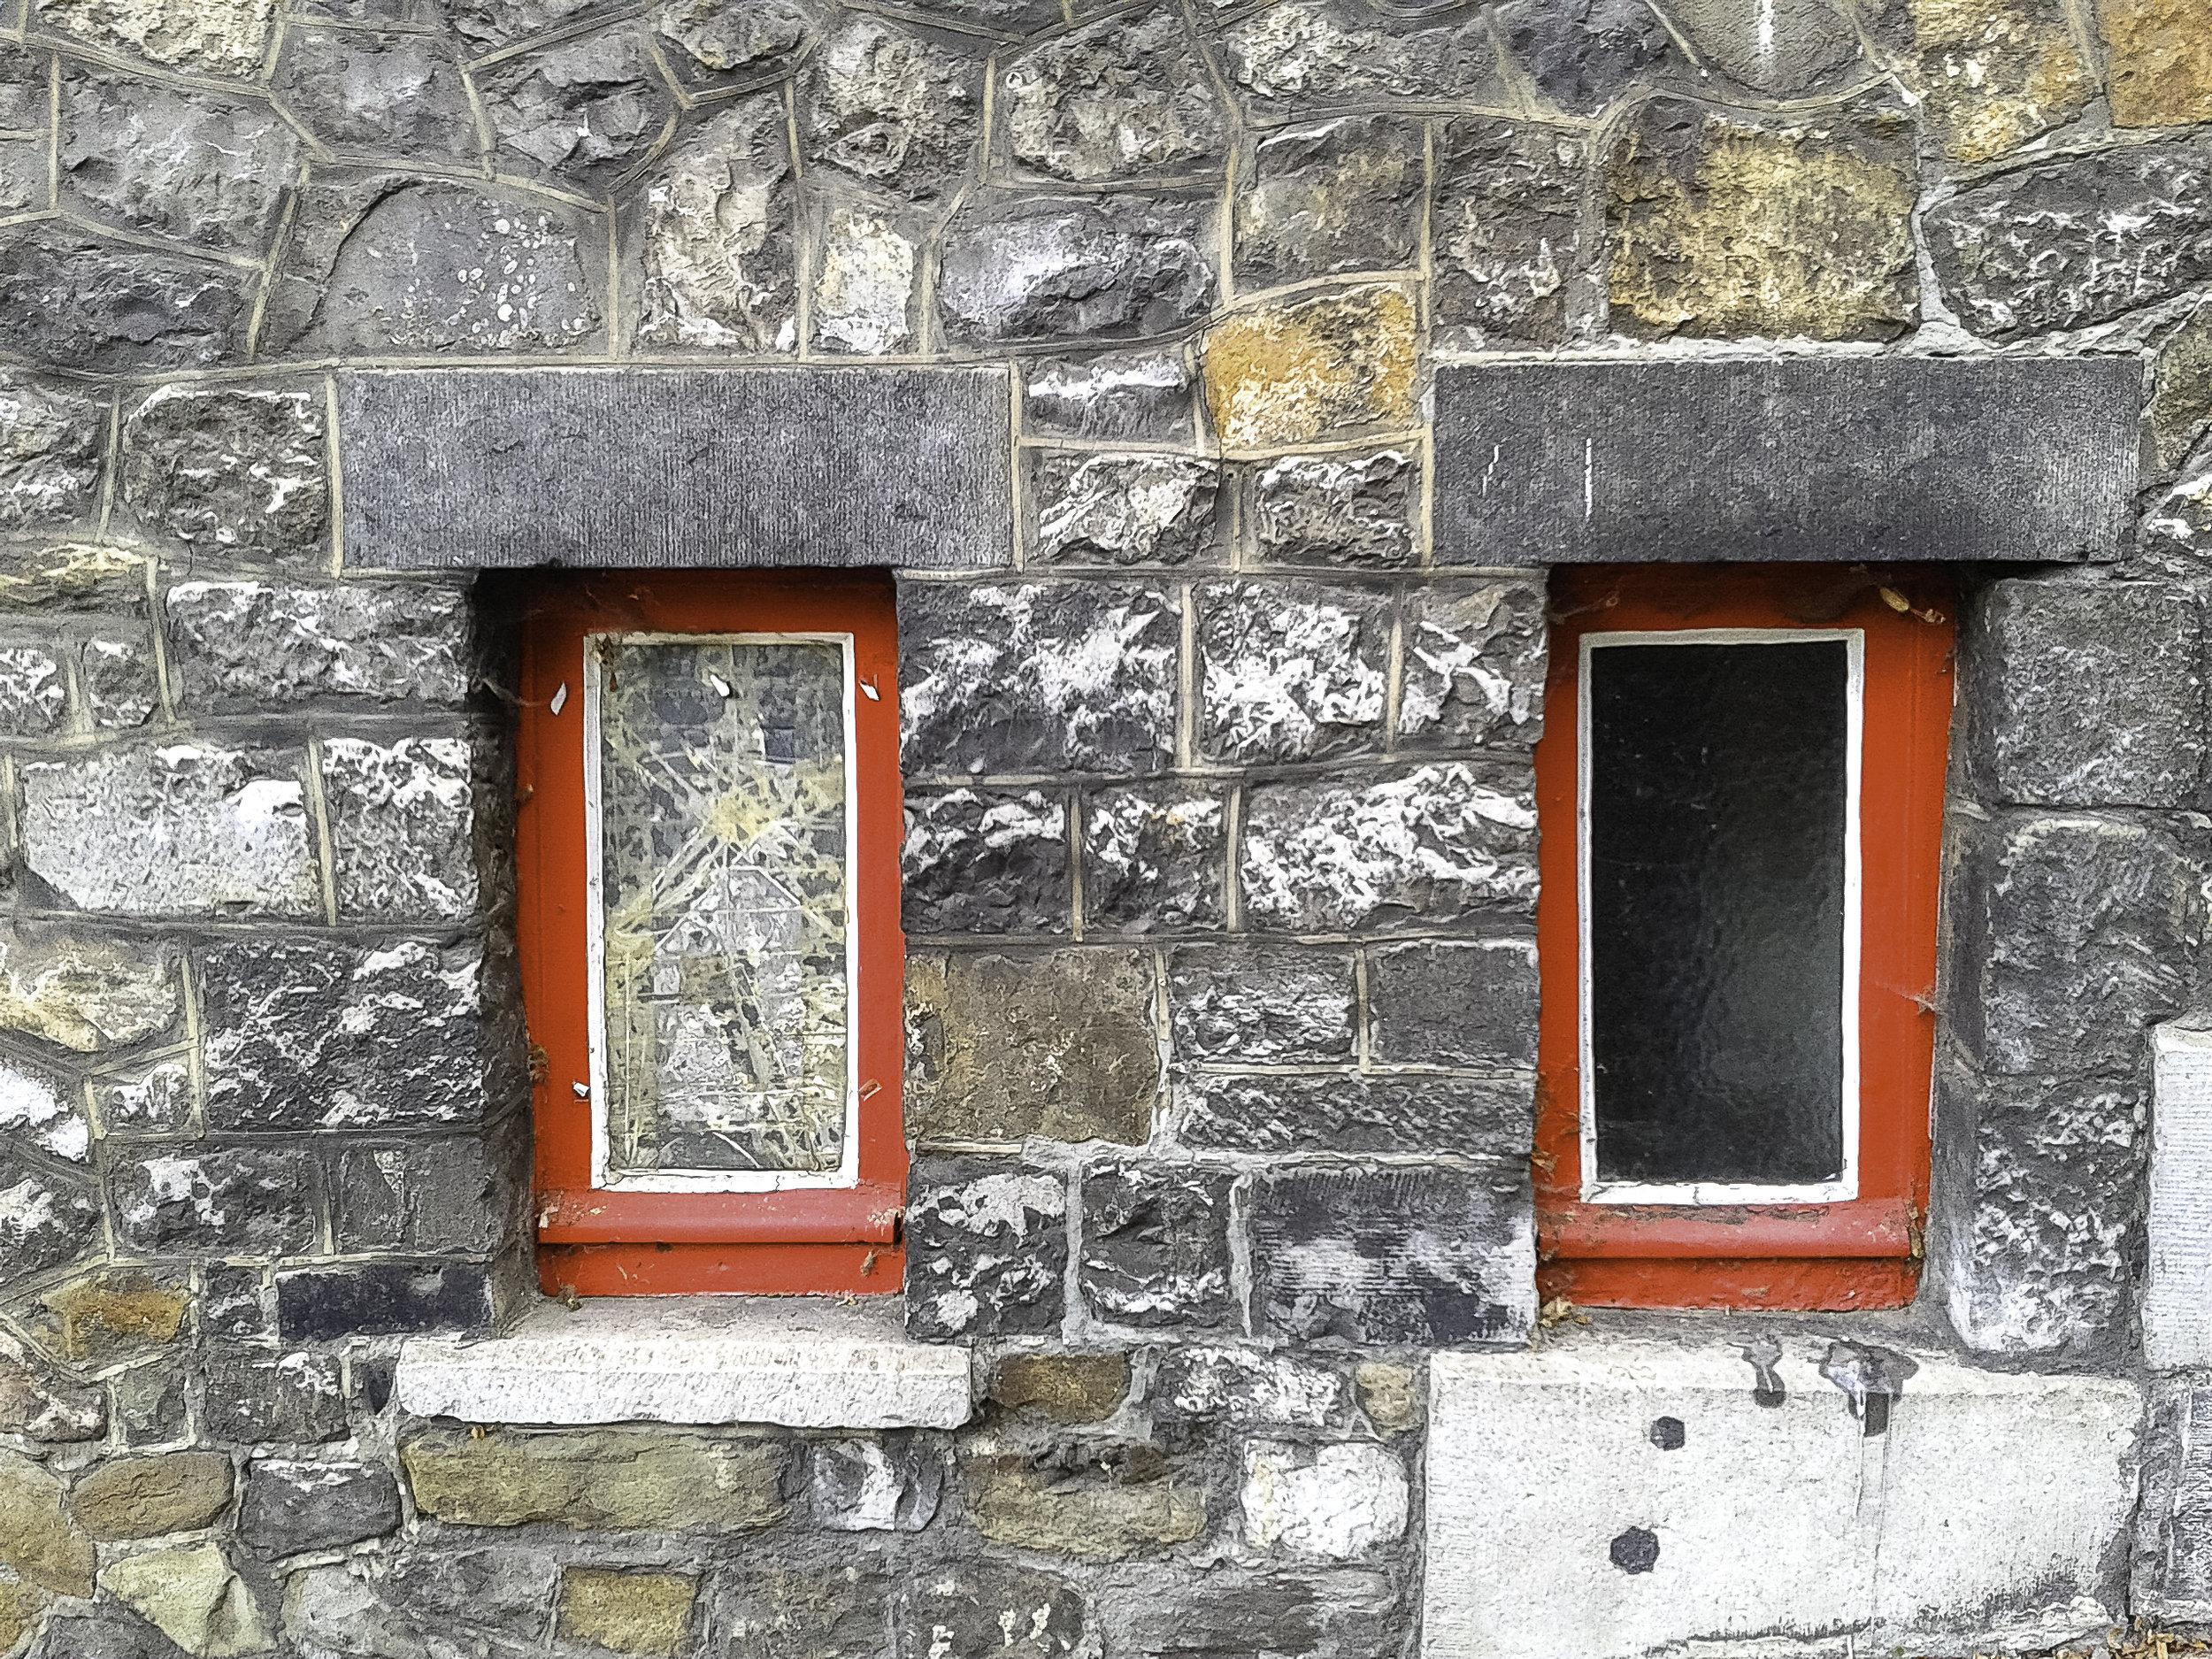 Red-windows-no-expression-Belgium.jpg